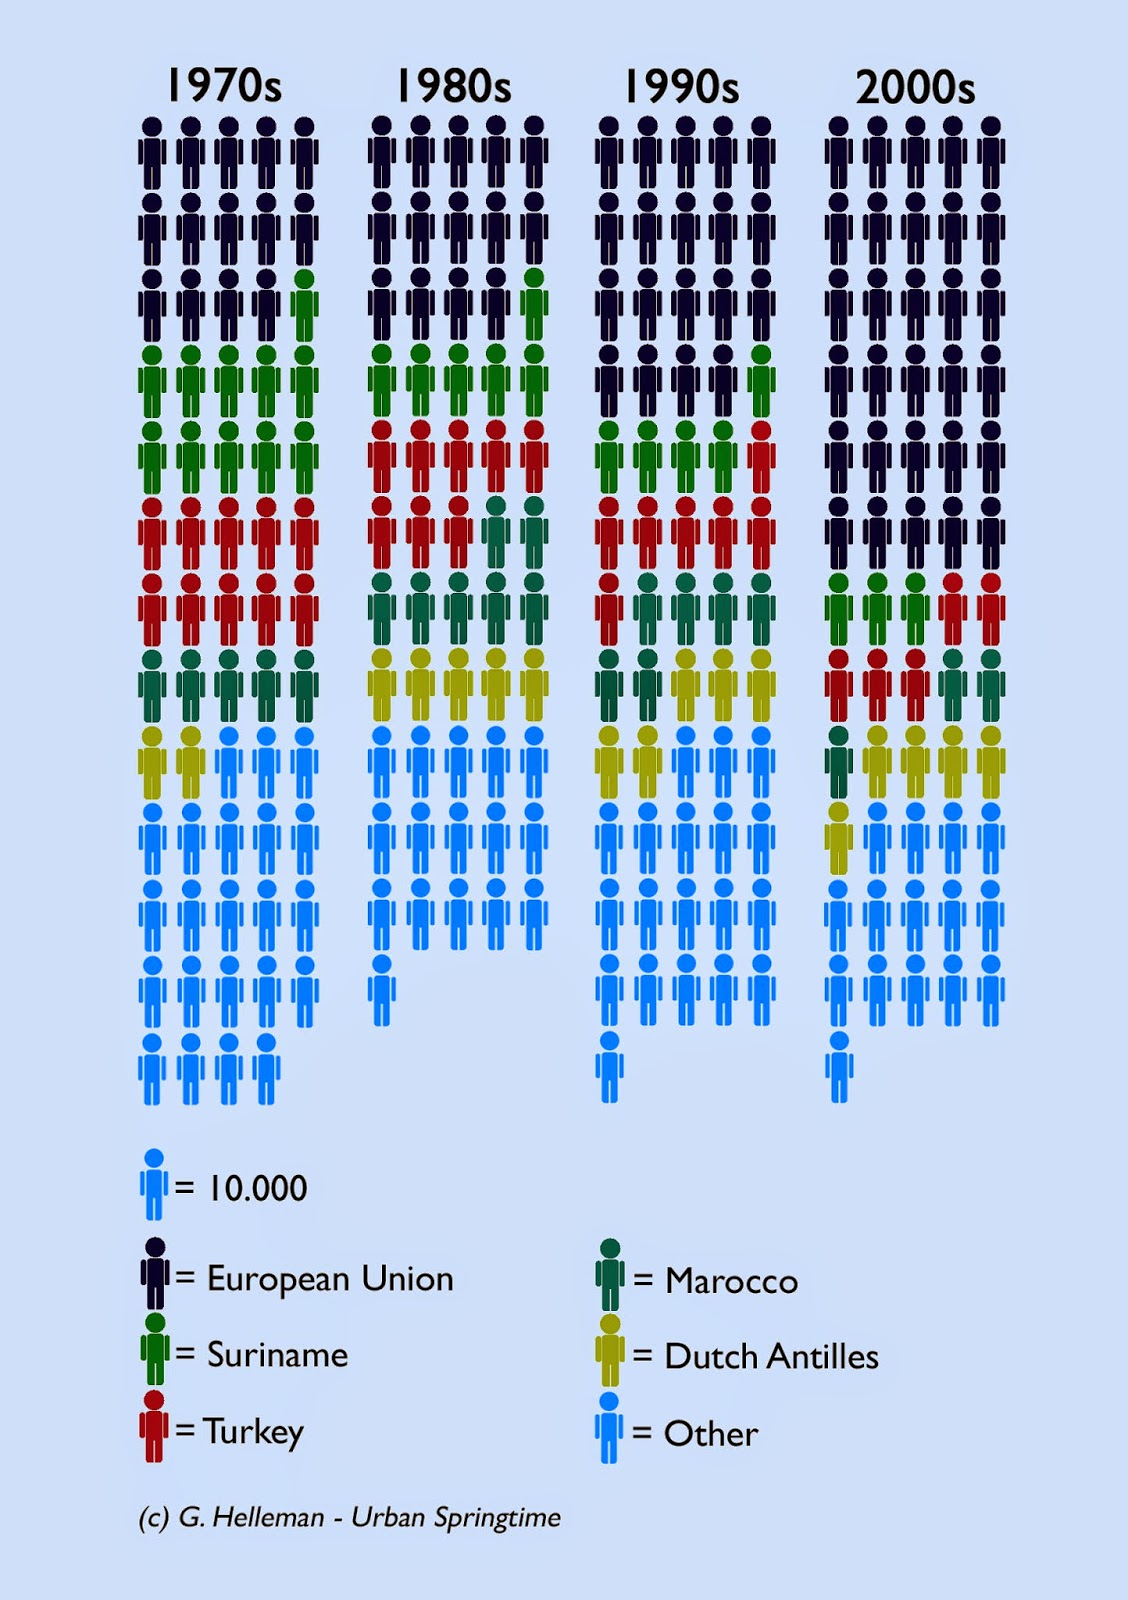 http://2.bp.blogspot.com/-HGuGmTM4n88/VL95KFzpCsI/AAAAAAAAARQ/EtdcO9vstiI/s1600/Migration%2Bto%2Bthe%2BNetherlands.jpg